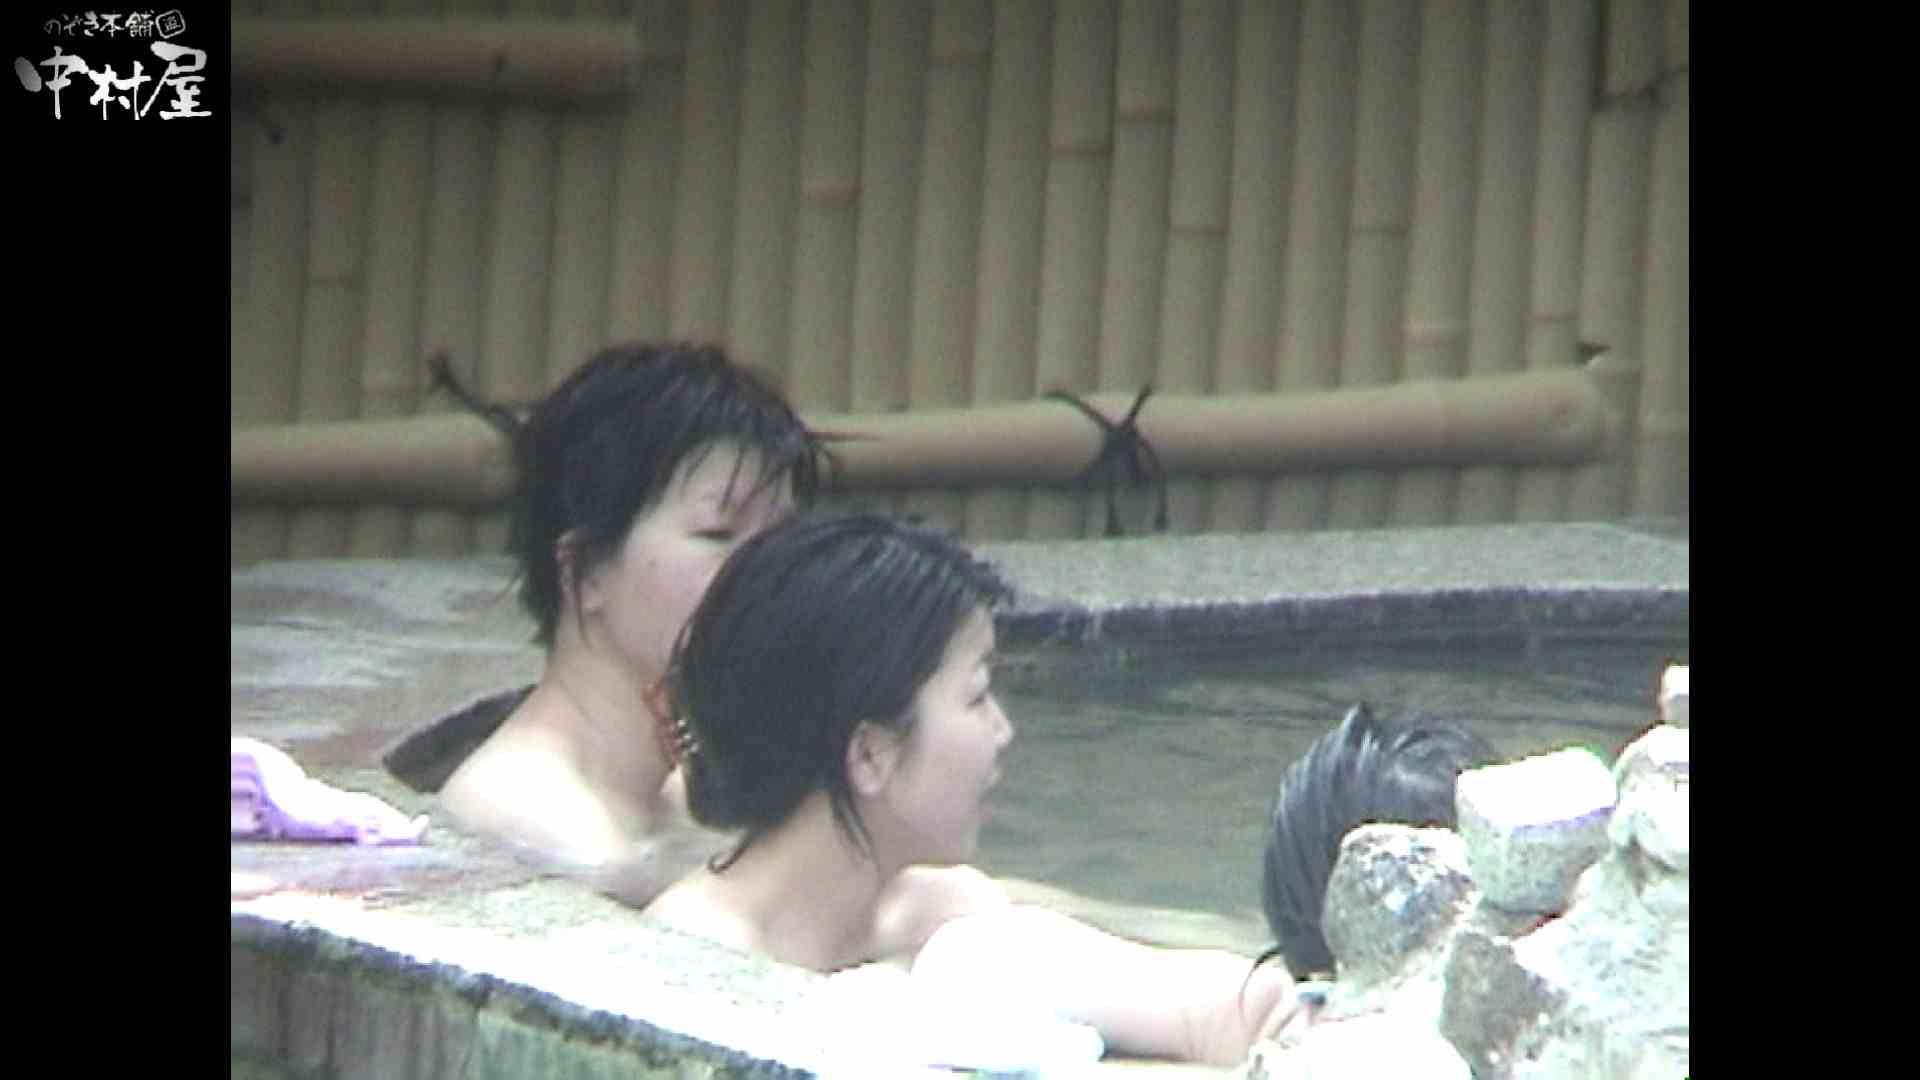 Aquaな露天風呂Vol.936 OLセックス 覗きぱこり動画紹介 75画像 32